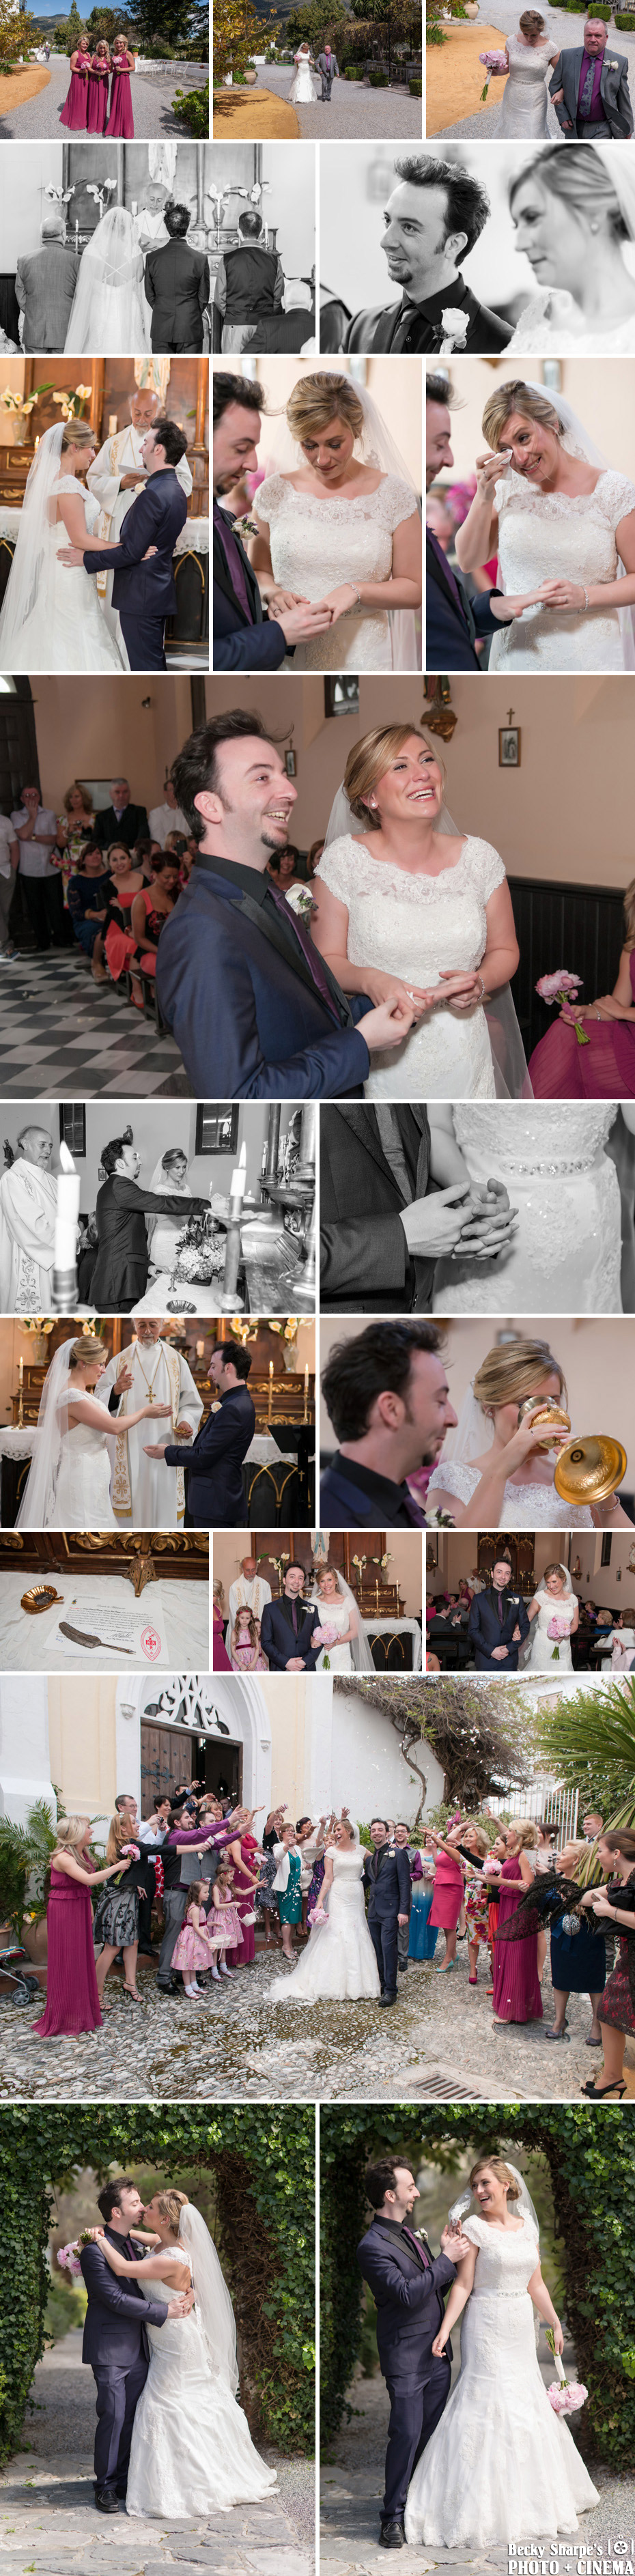 wedding-photographer-granada-church-ceremony-spain